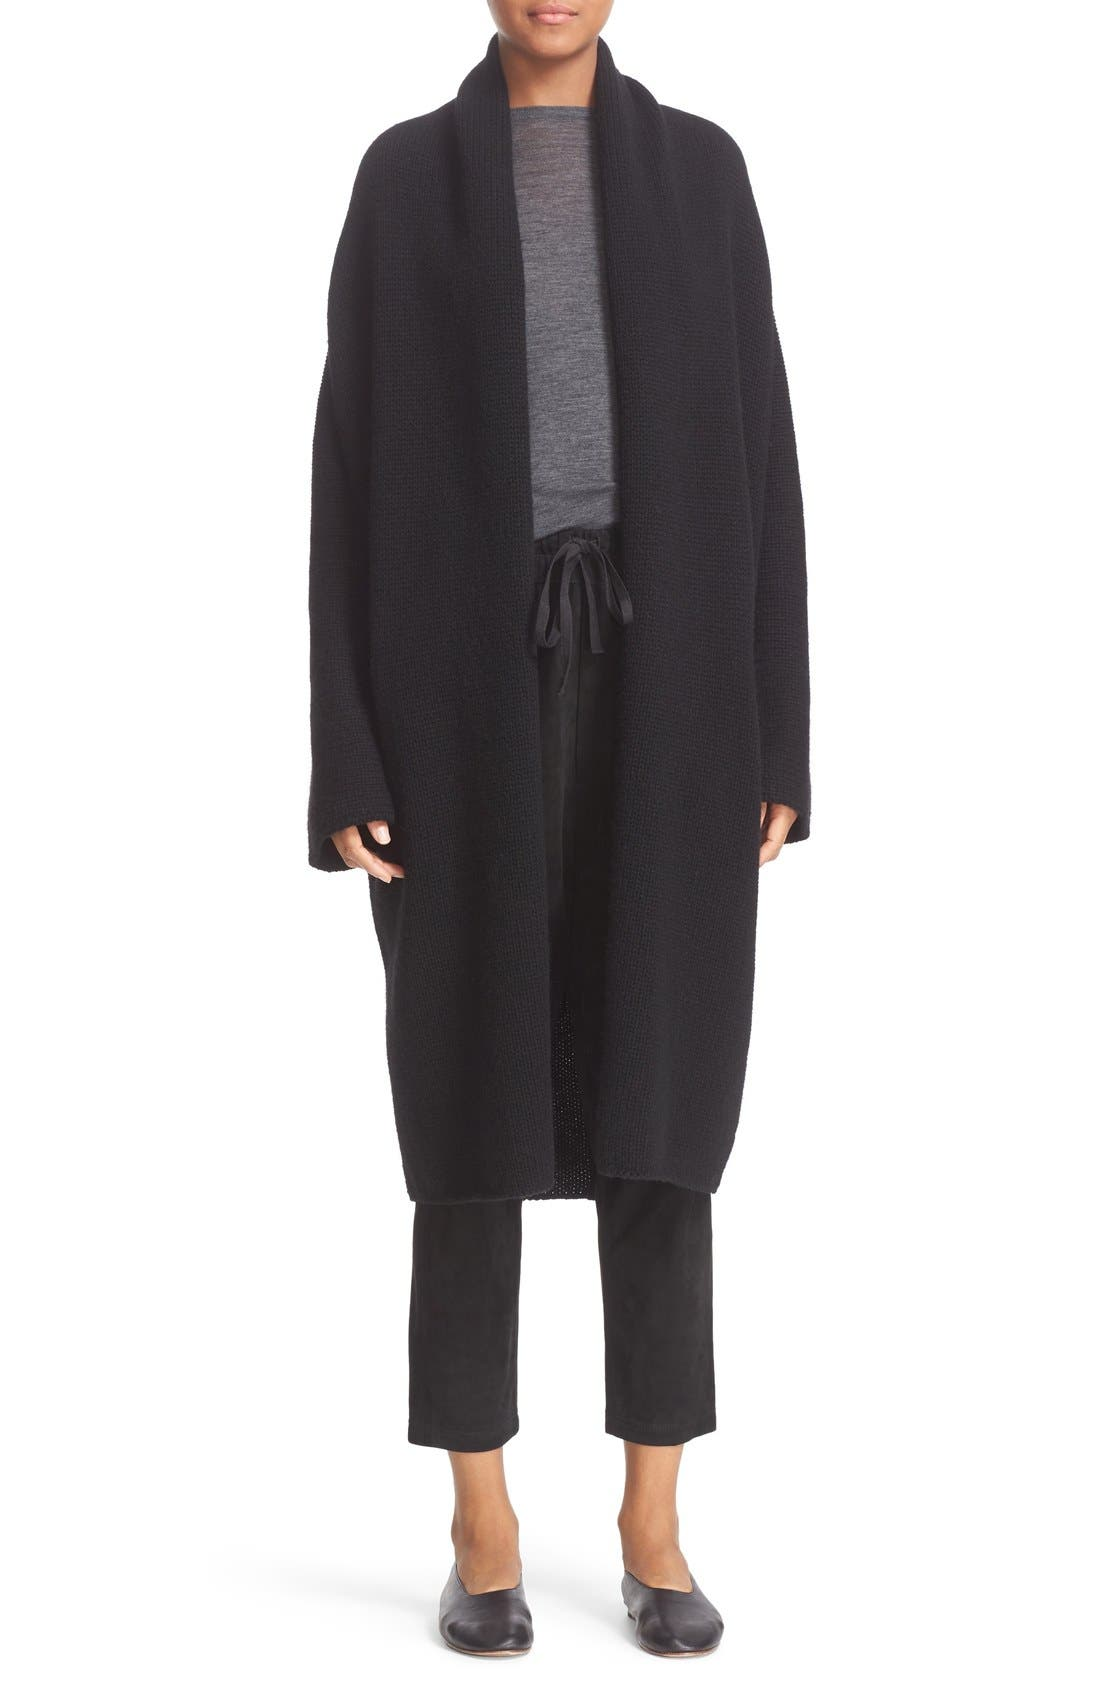 VINCE Wool & Yak Robe Cardigan, Main, color, 001